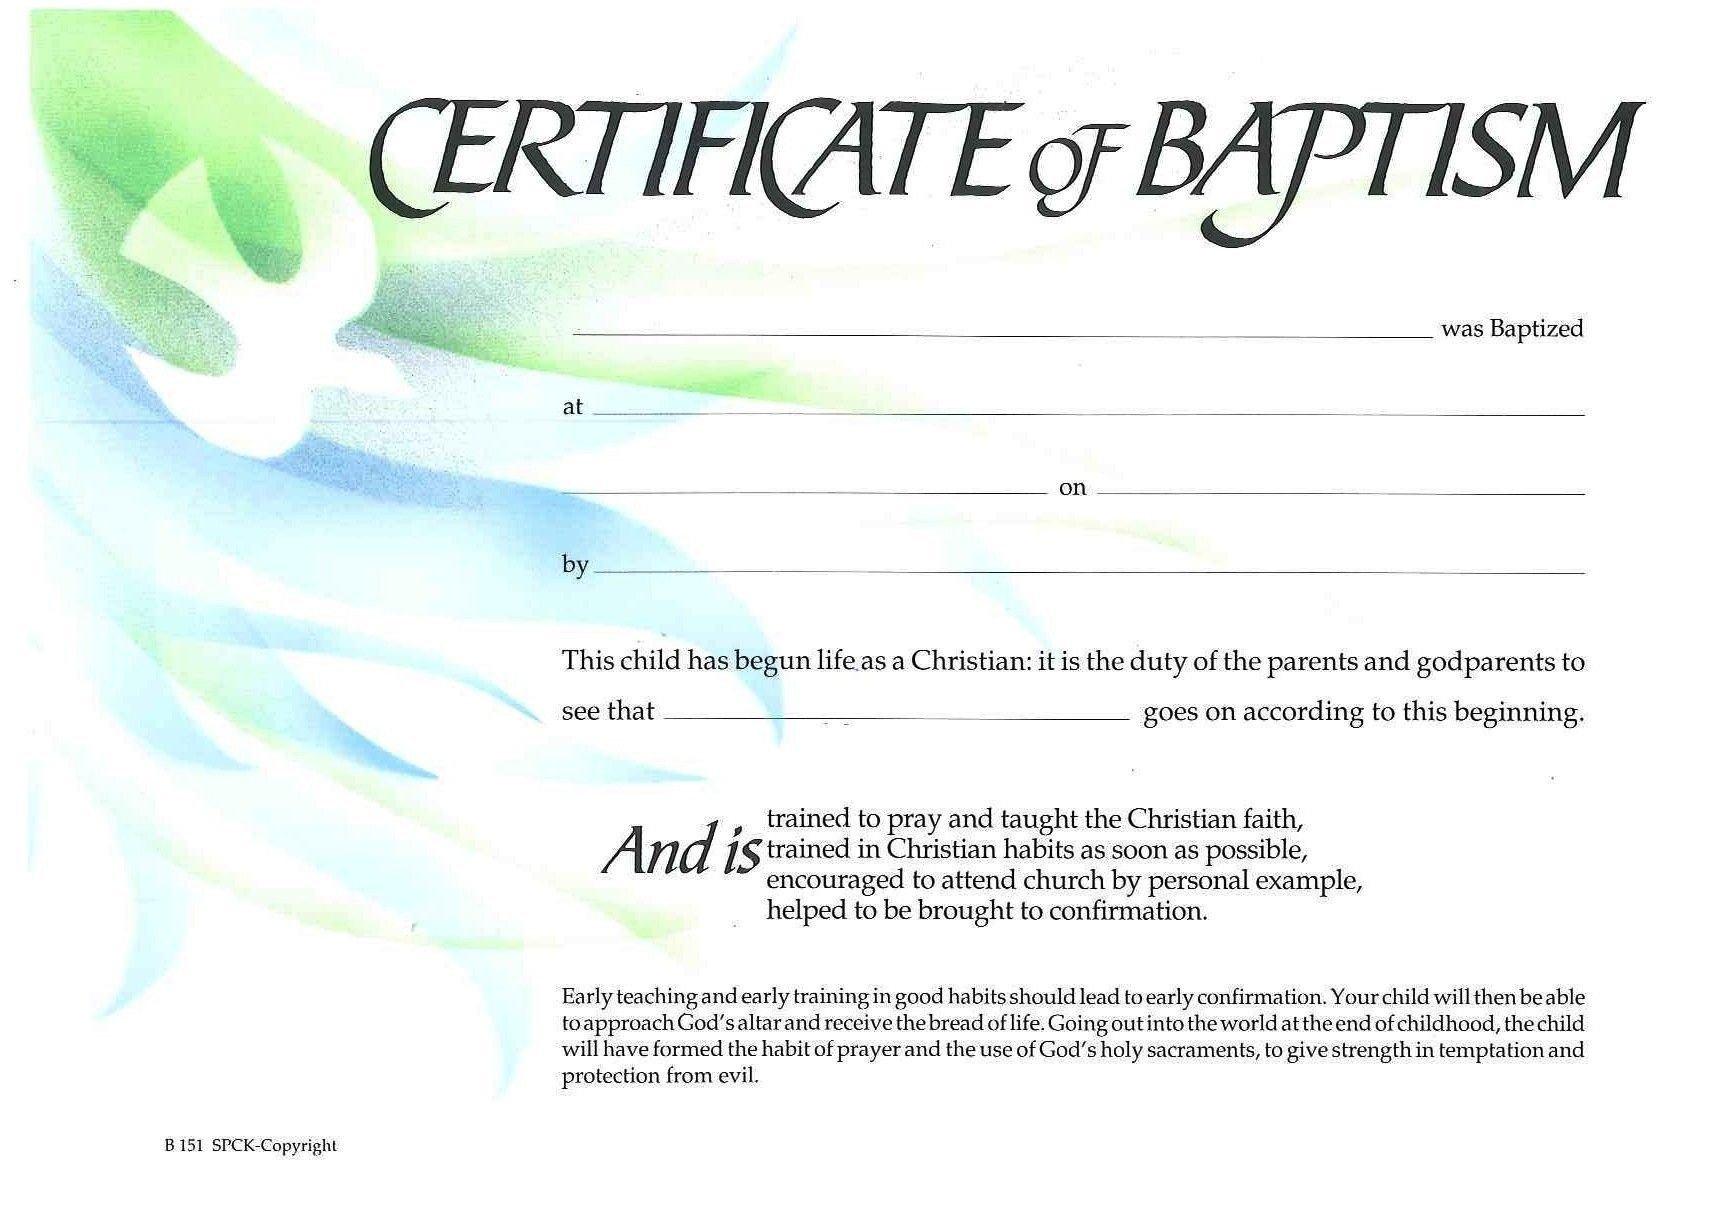 Certificate Of Baptism Template Baptism Certificate Xp4eamuz Sunday School